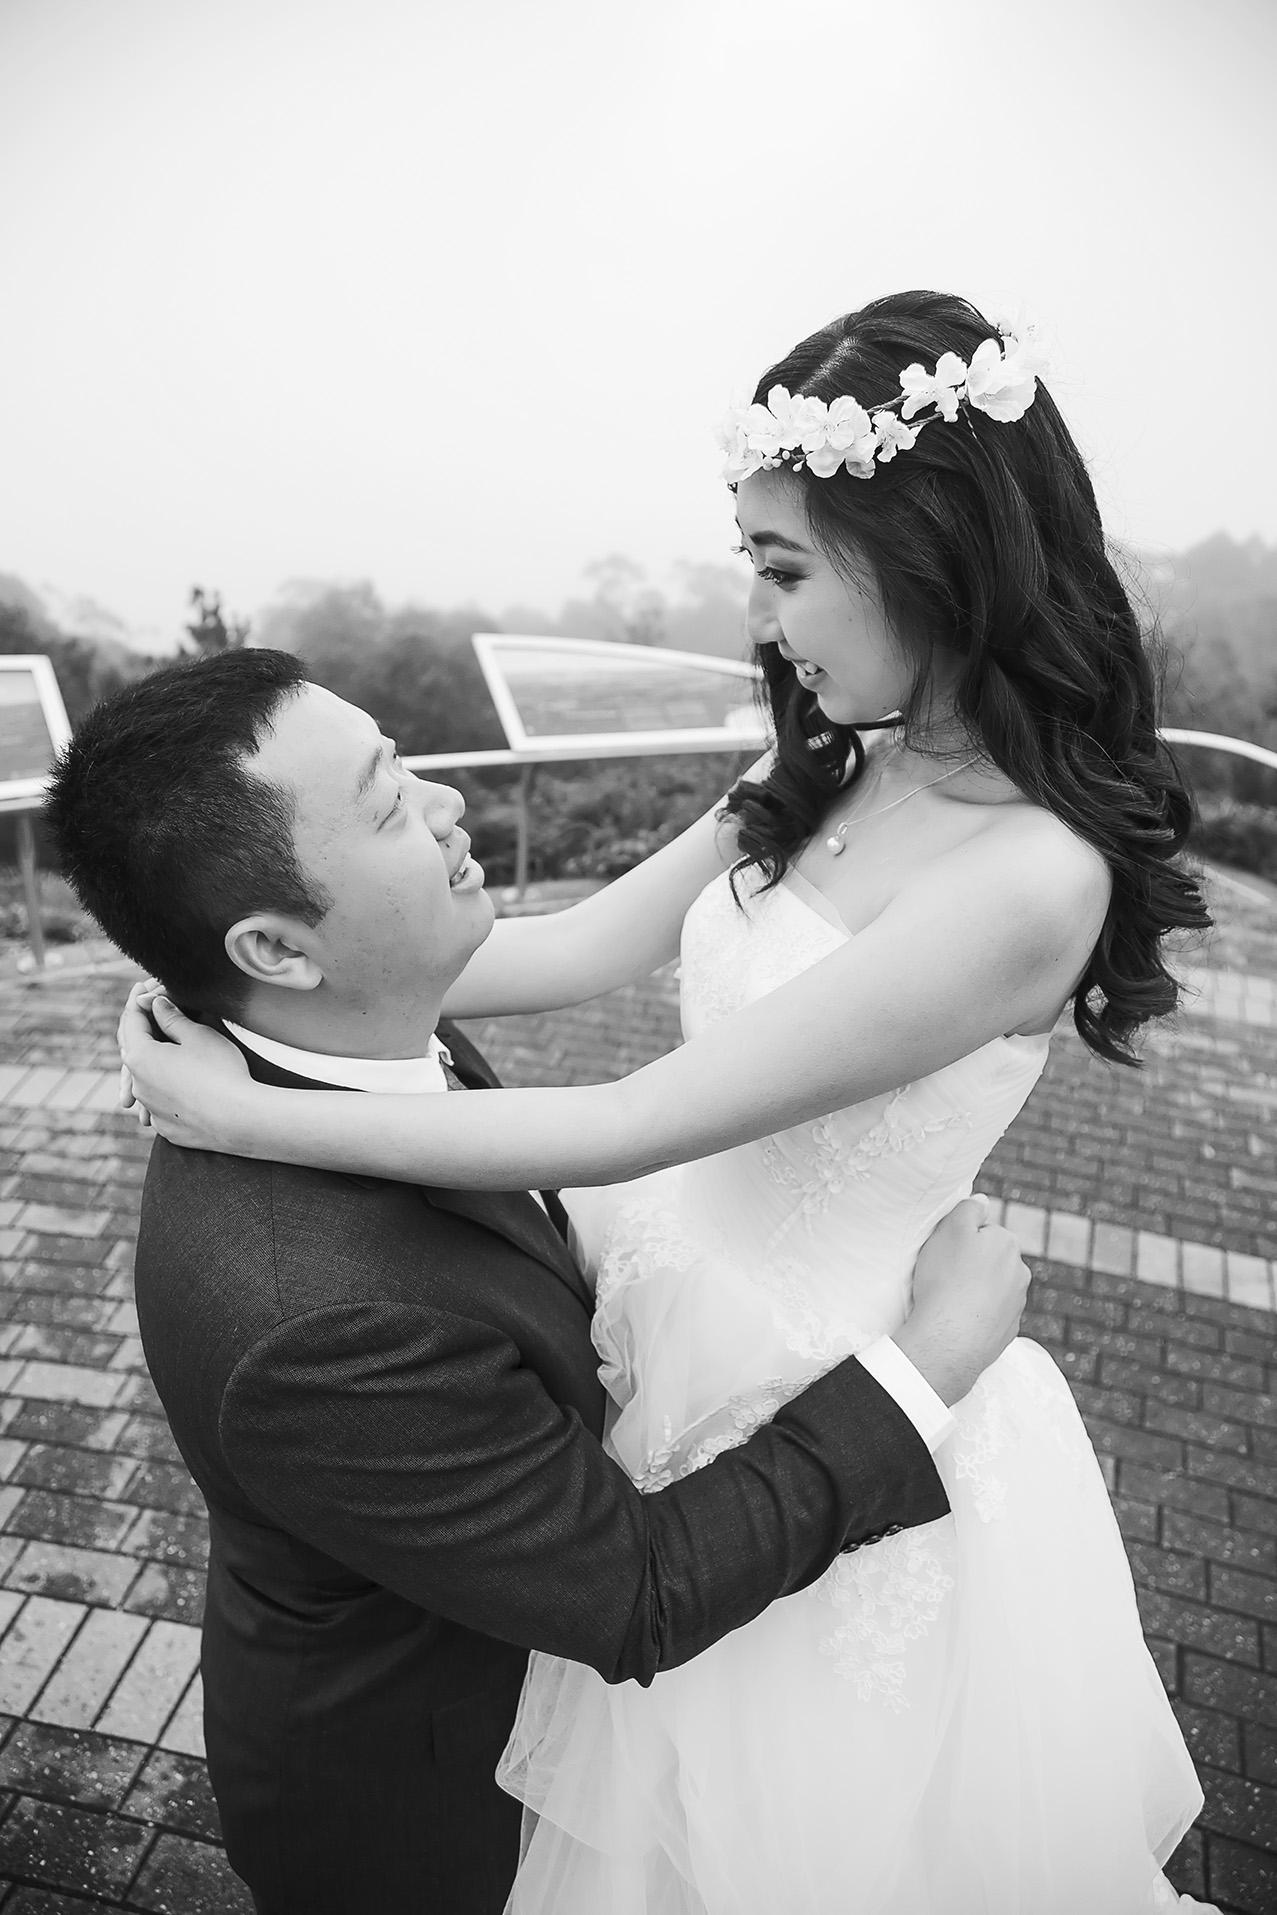 Artistic Black and White Wedding Photo 2